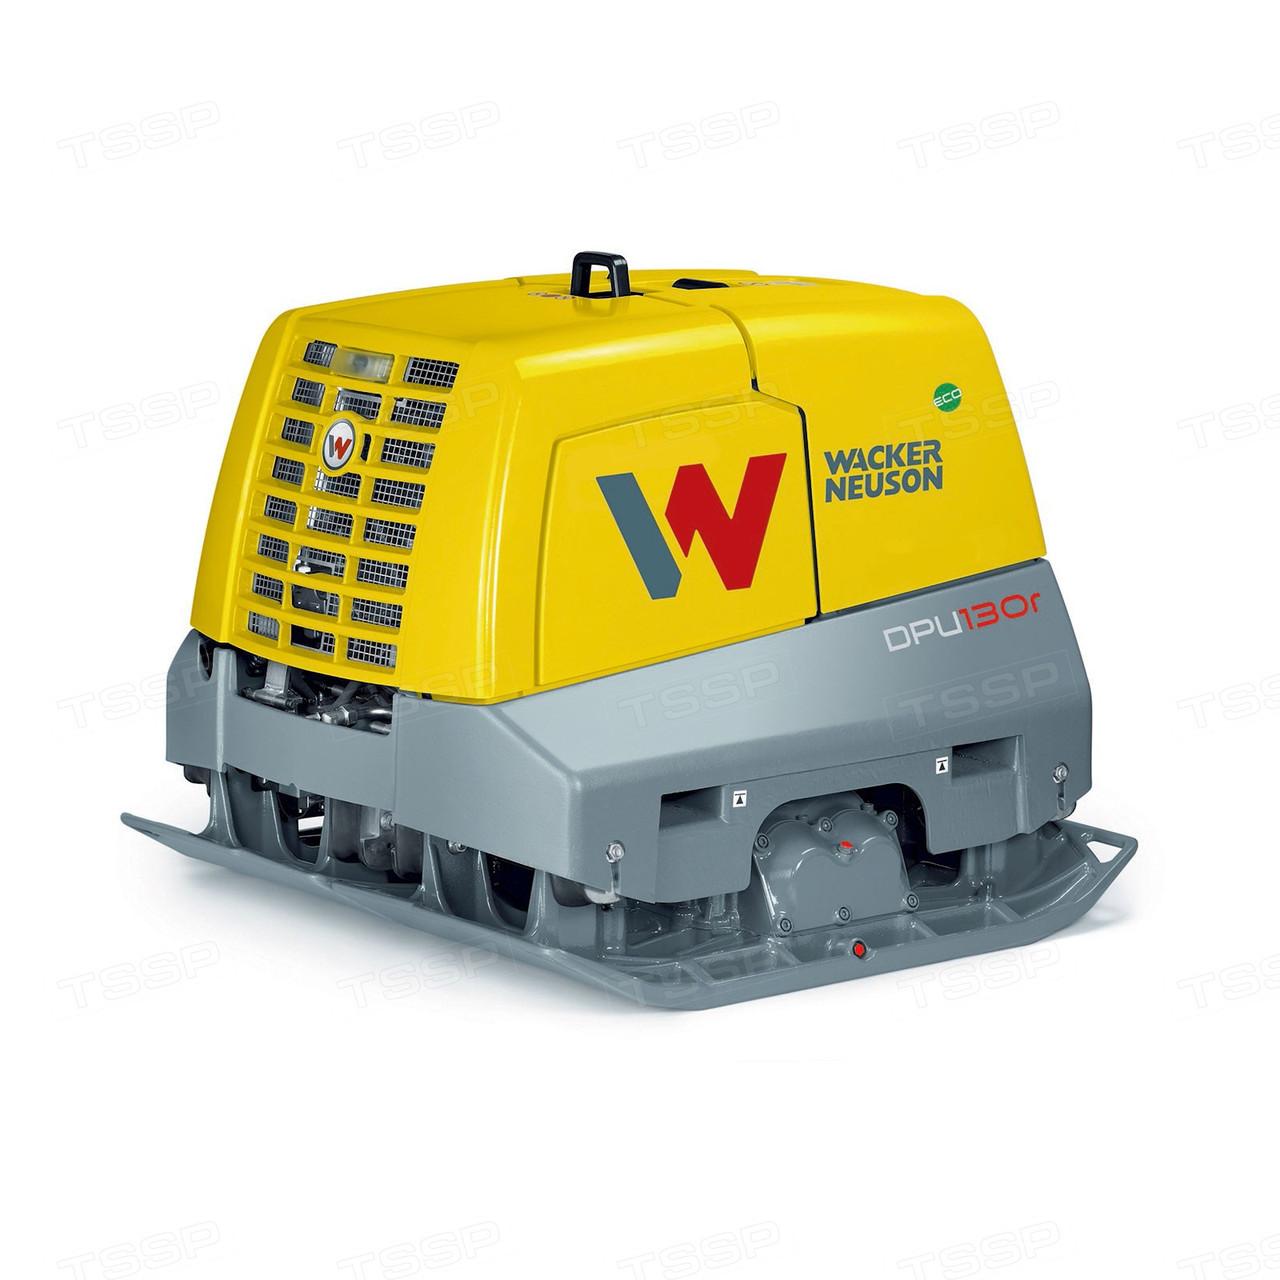 Виброплита Wacker Neuson DPU 130r